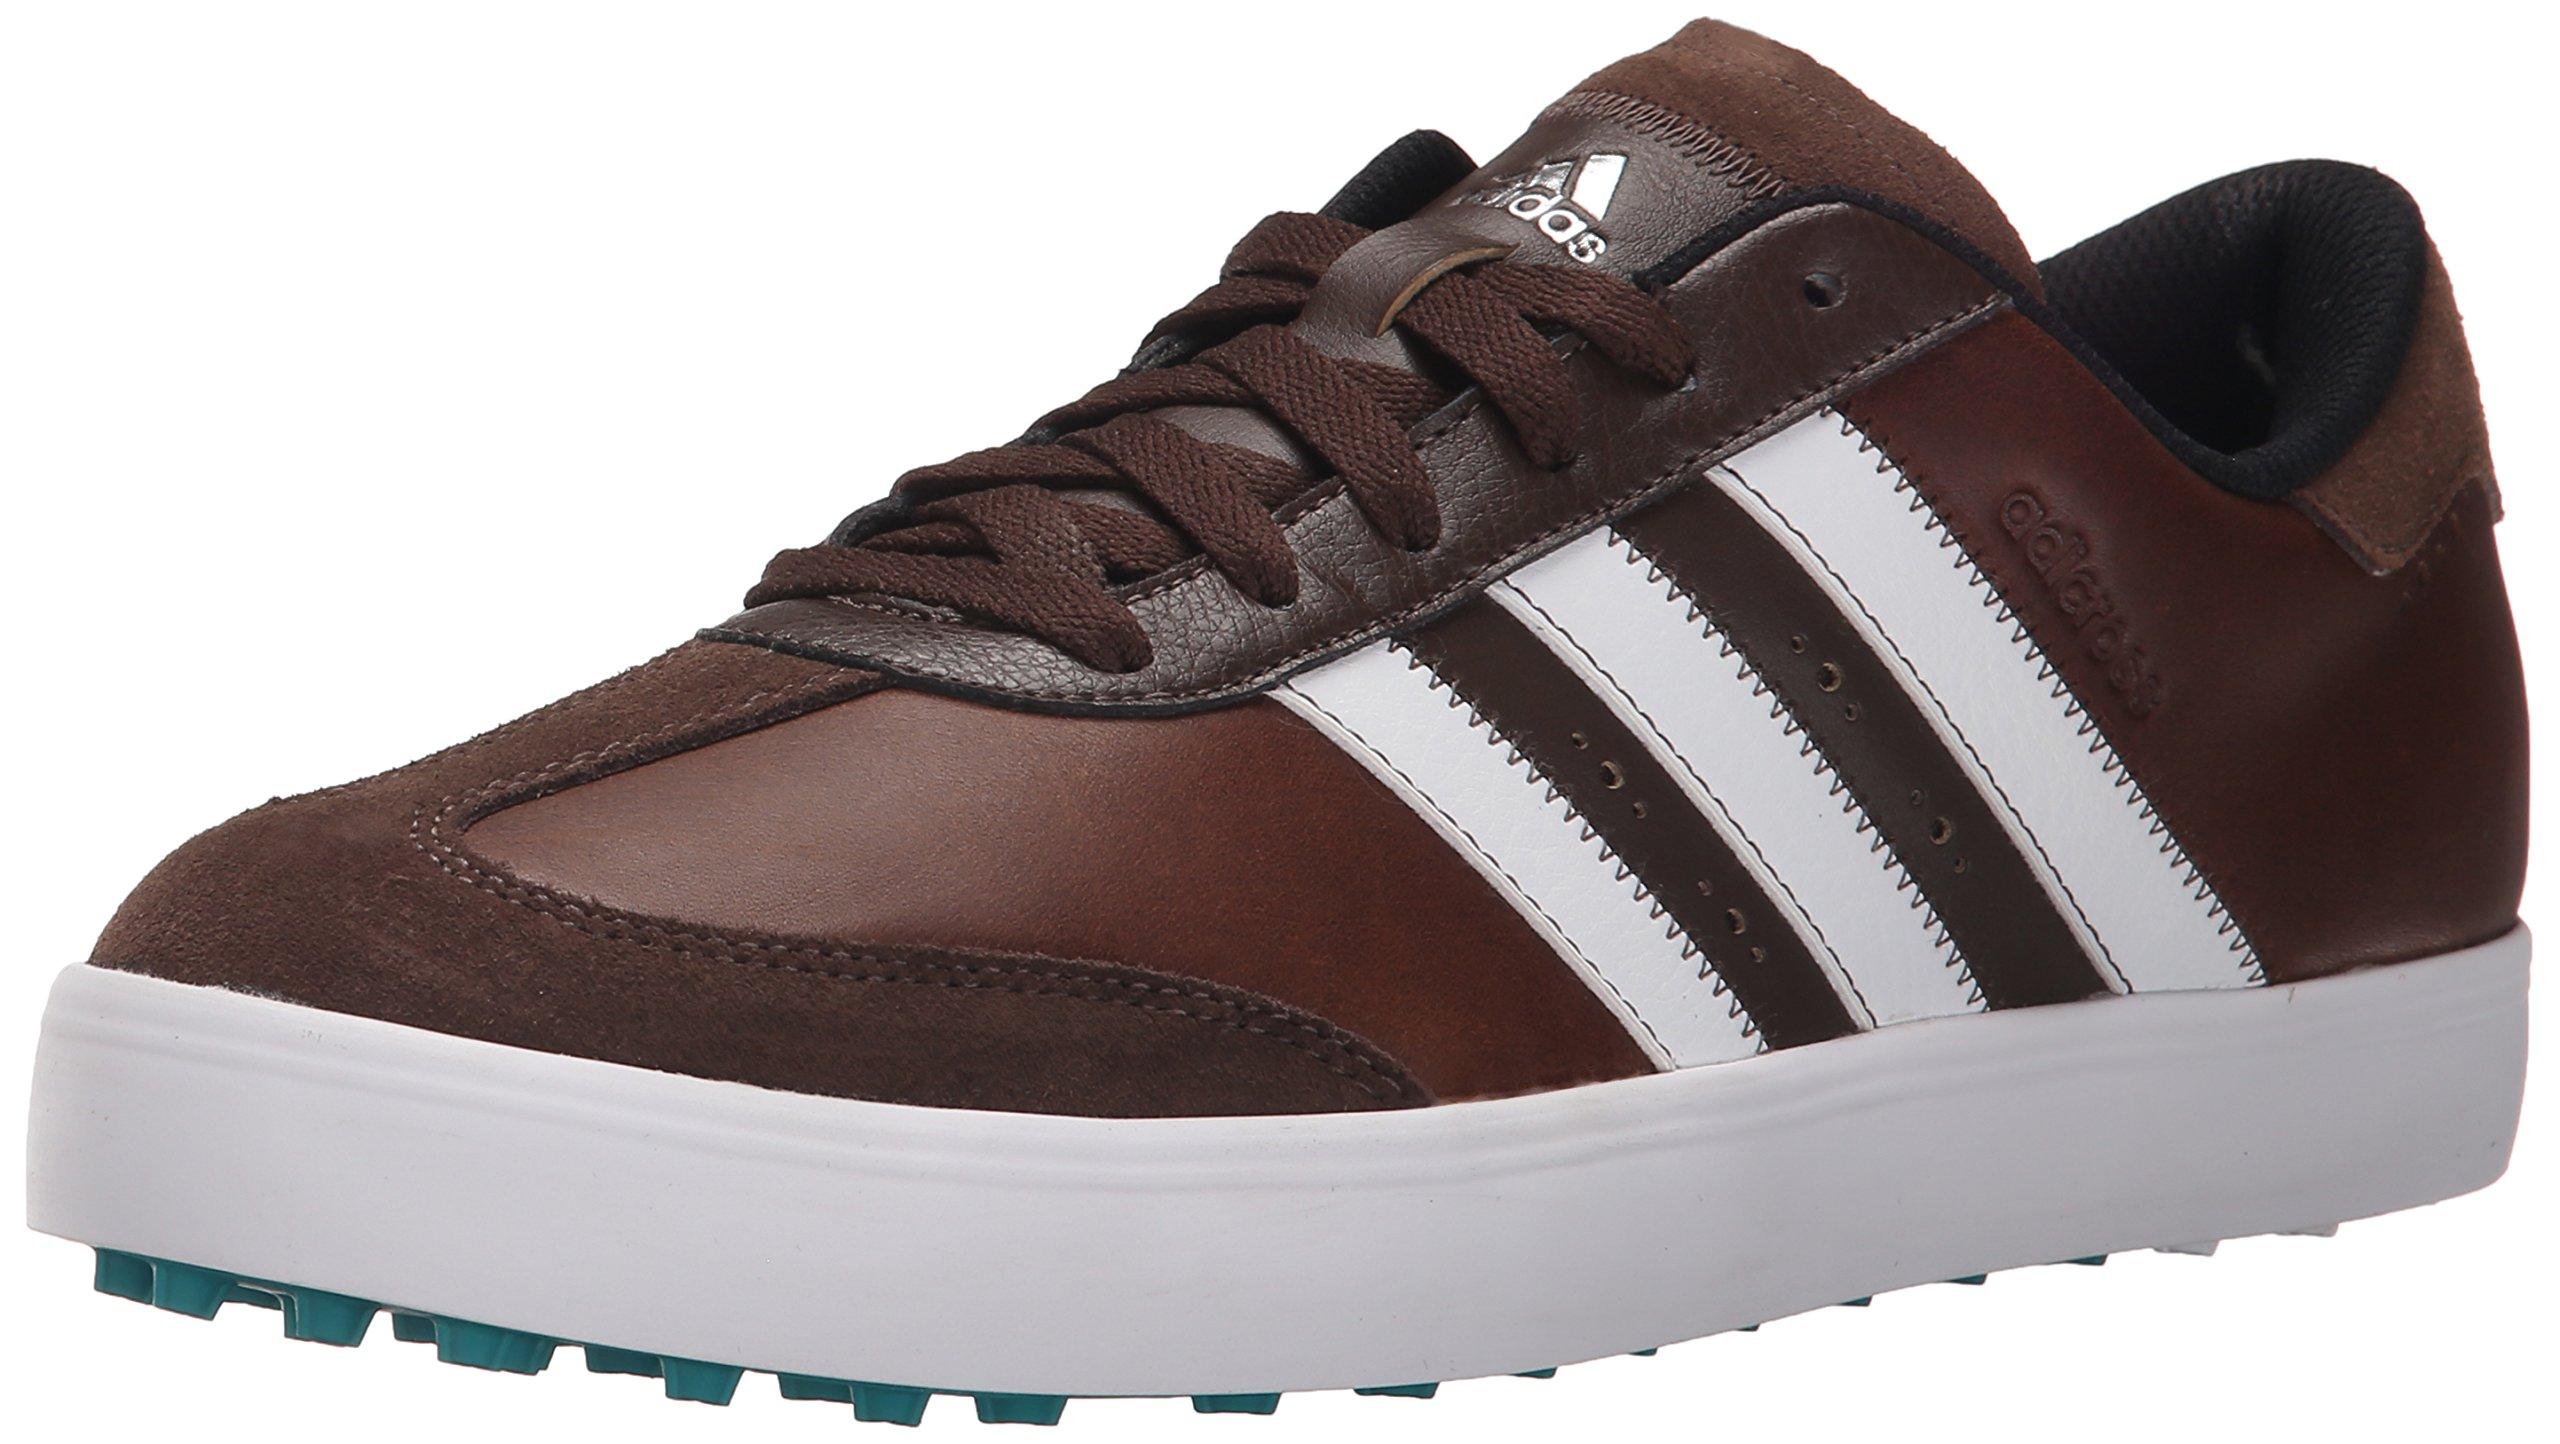 adidas Men's Adicross V Golf Shoe, Brown/White/EQT Green, 10.5 M US by adidas